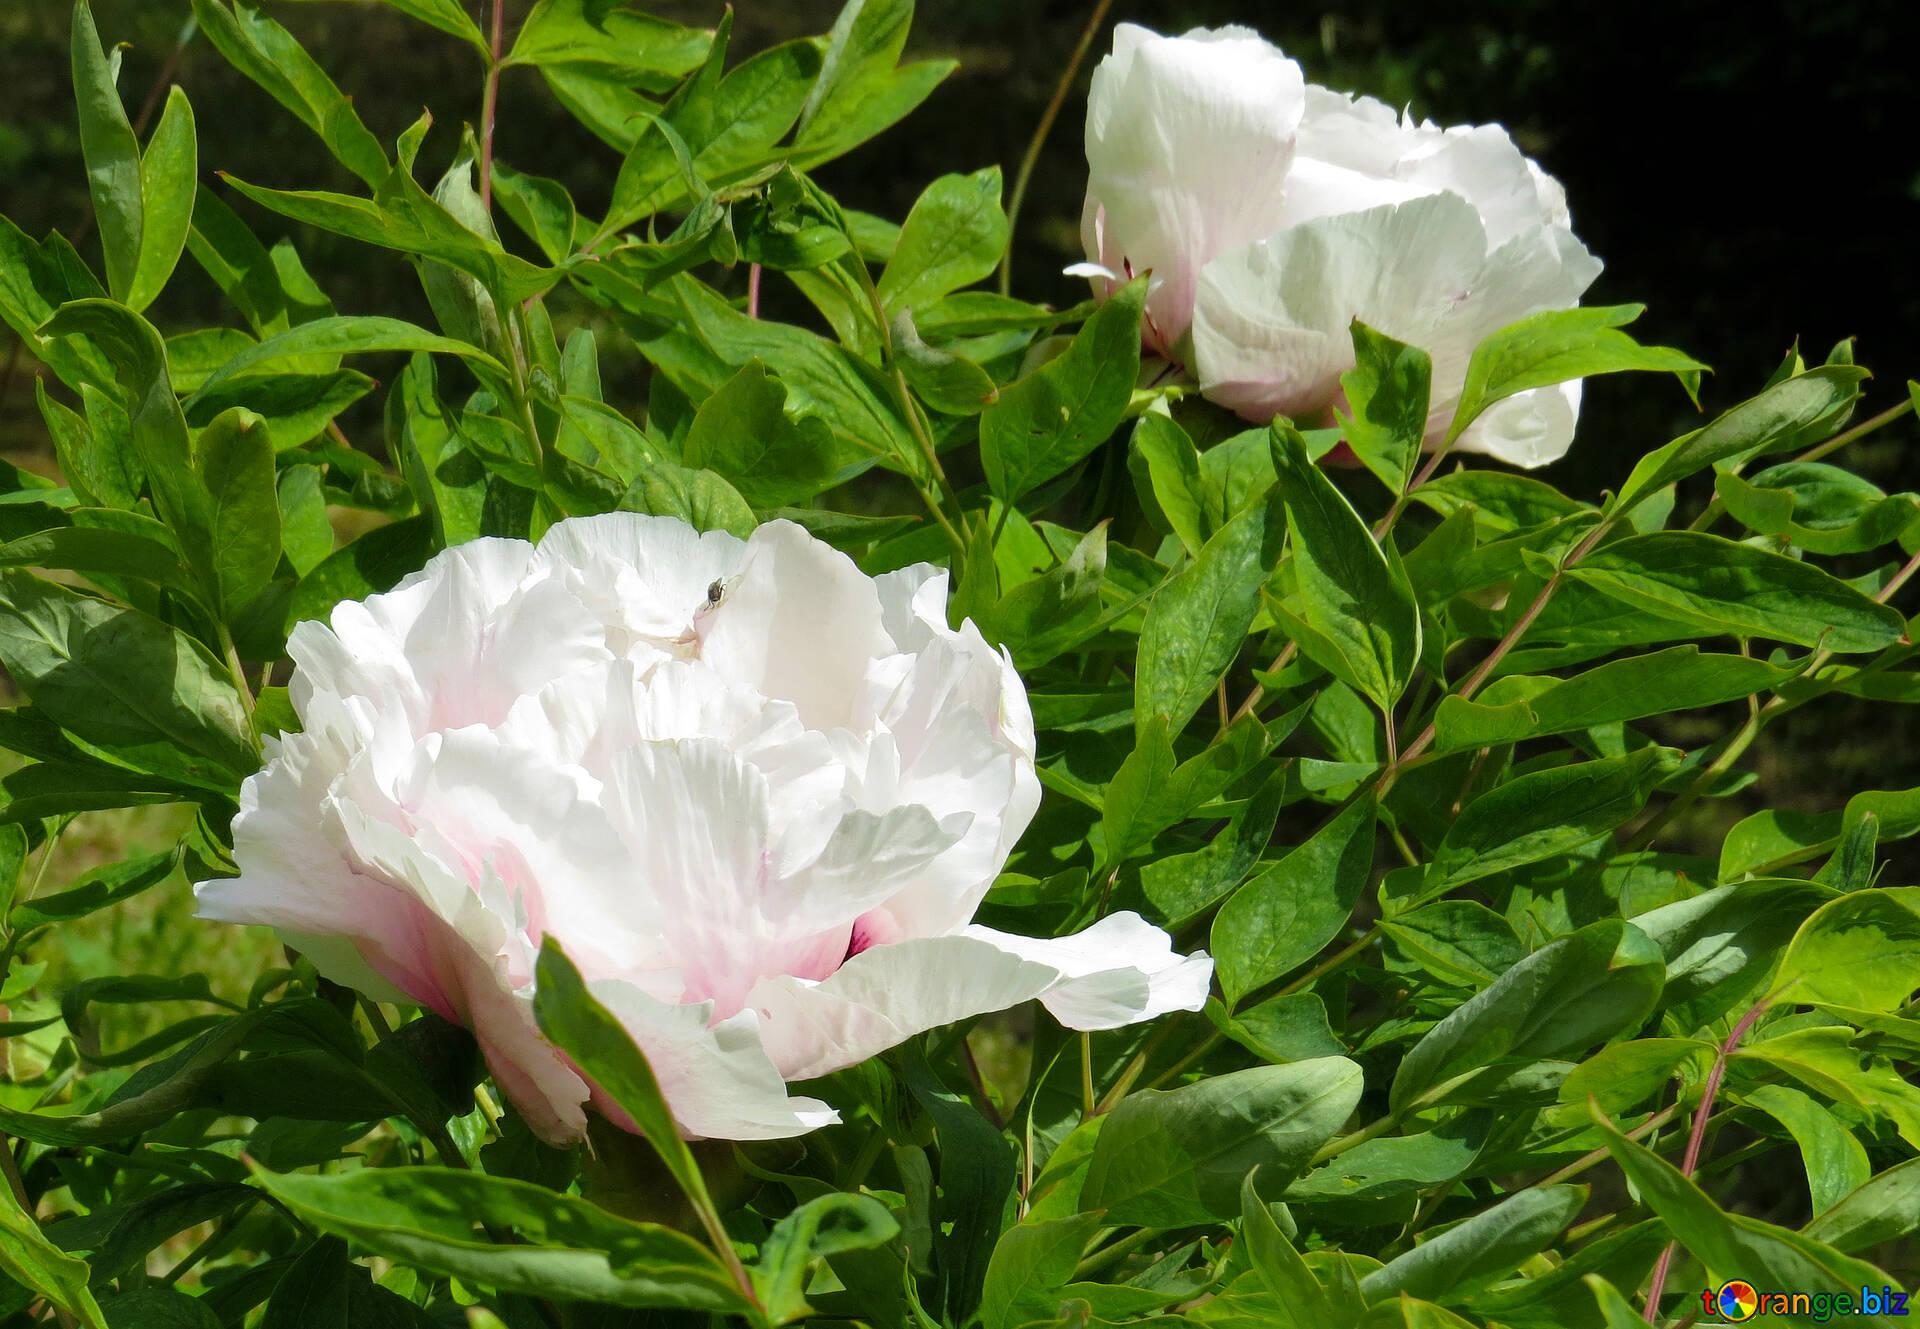 White flowers a flowering bush white flowers flower 37321 a flowering bush white flowers mightylinksfo